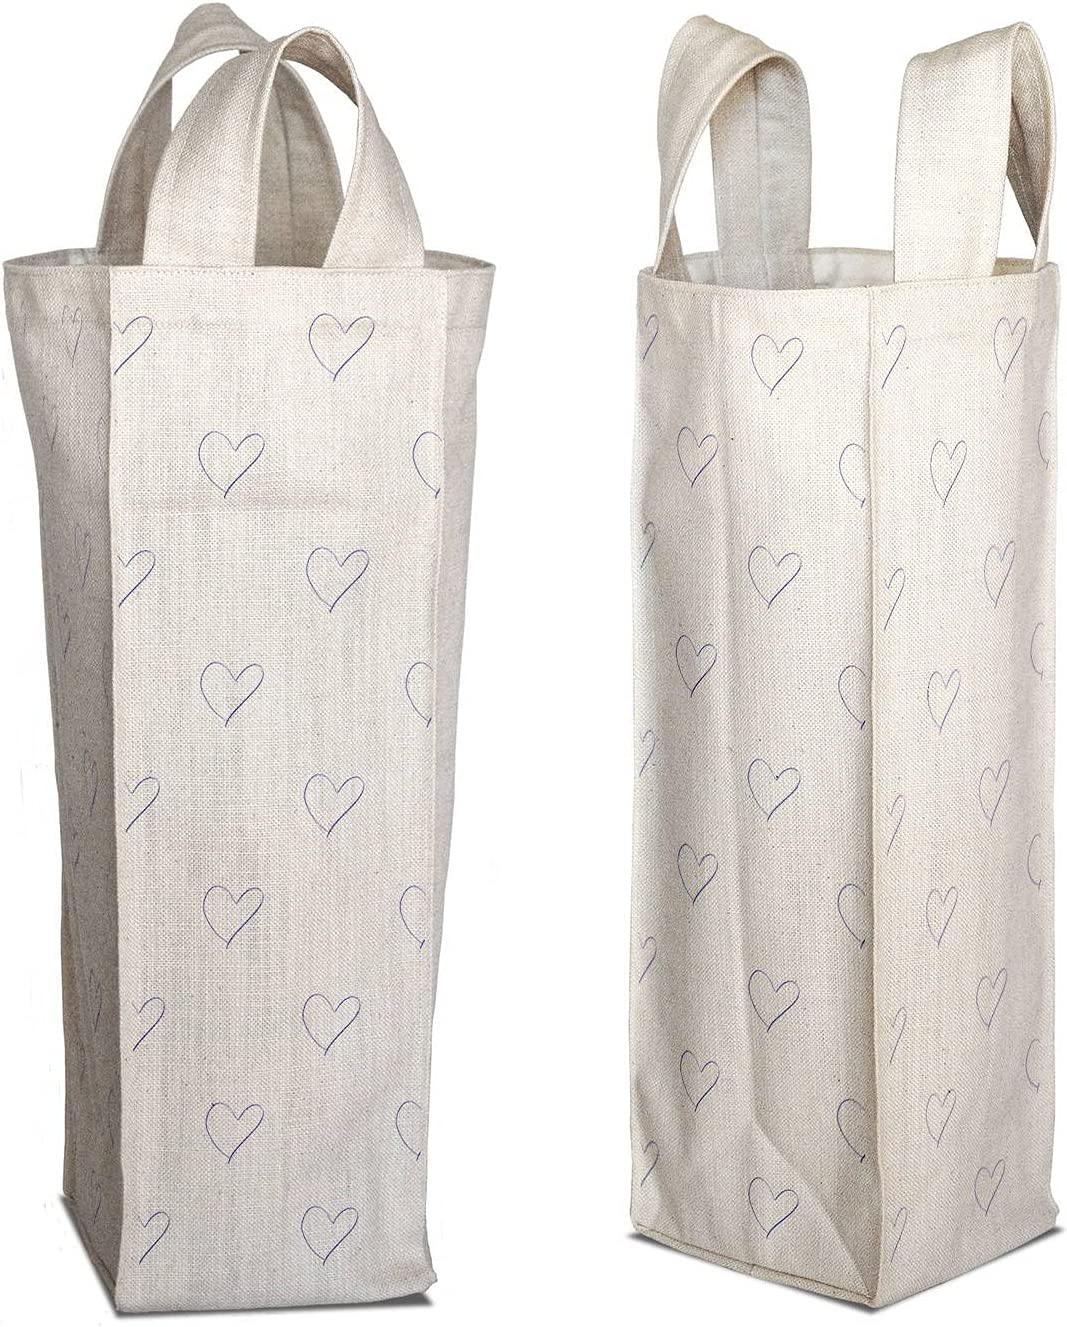 Store Bombing free shipping Bonamaison Digitally Printed Cotton Multicolor Canvas Wine Bag